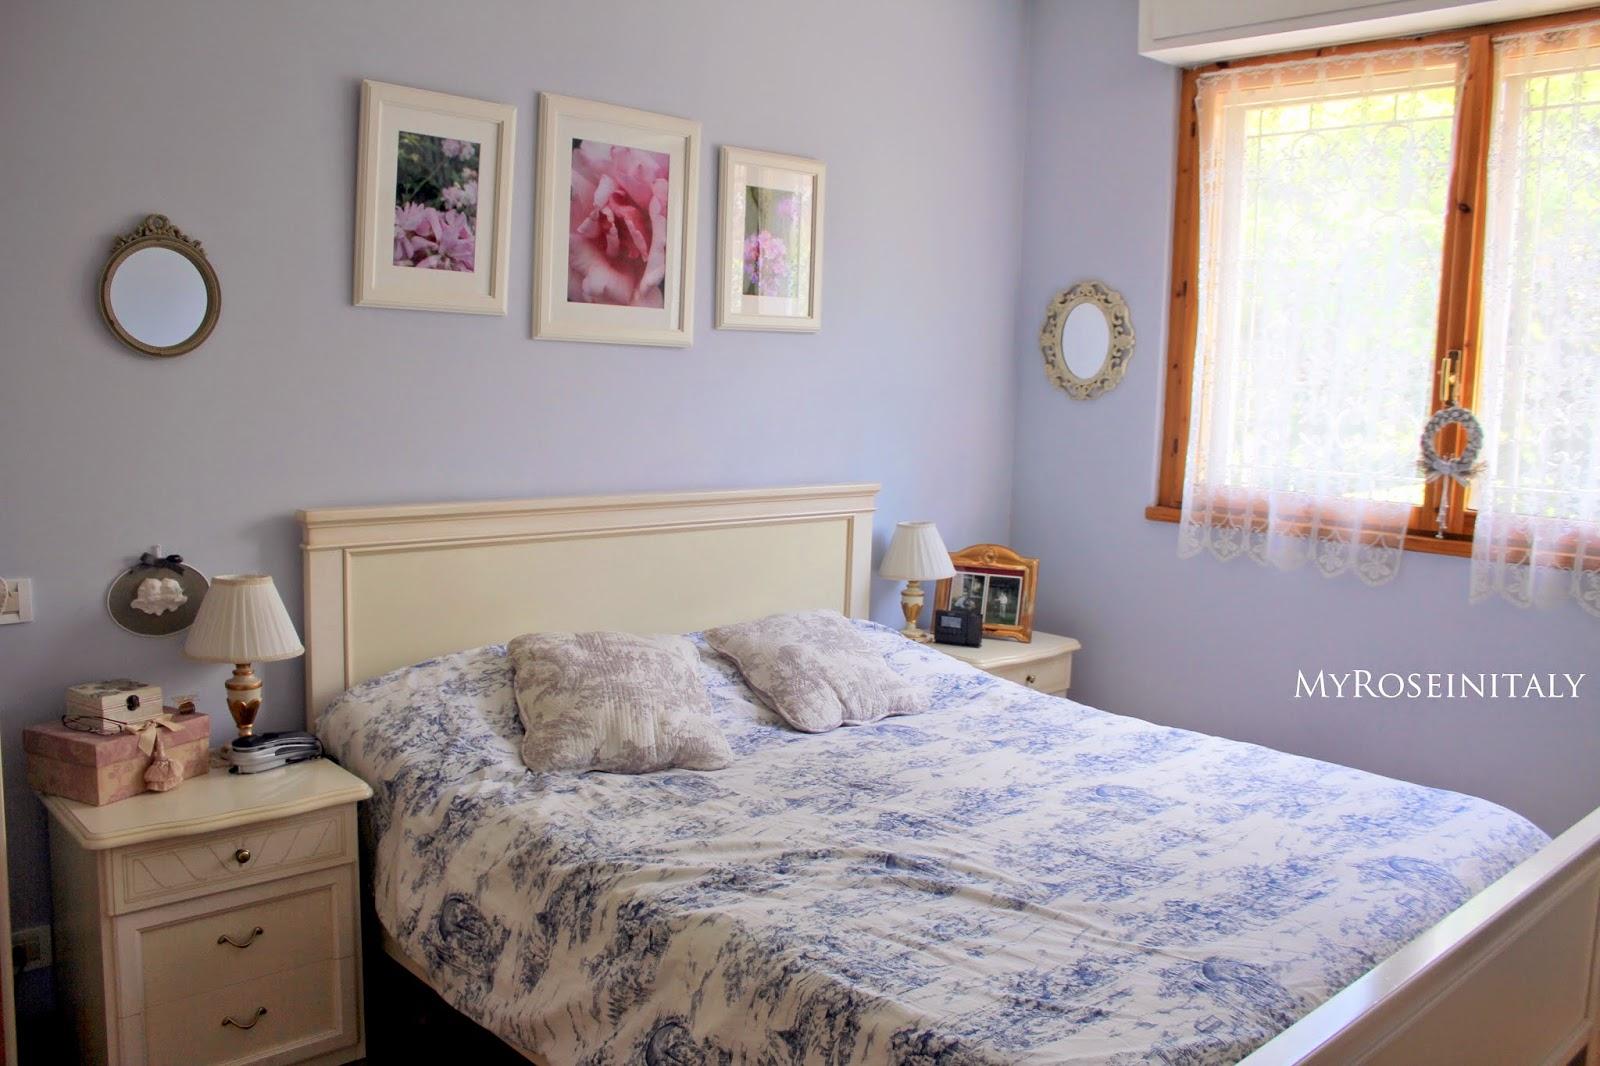 My roseinitaly rinnovare casa oggi si comincia dalla camera da letto - Rinnovare la camera da letto ...